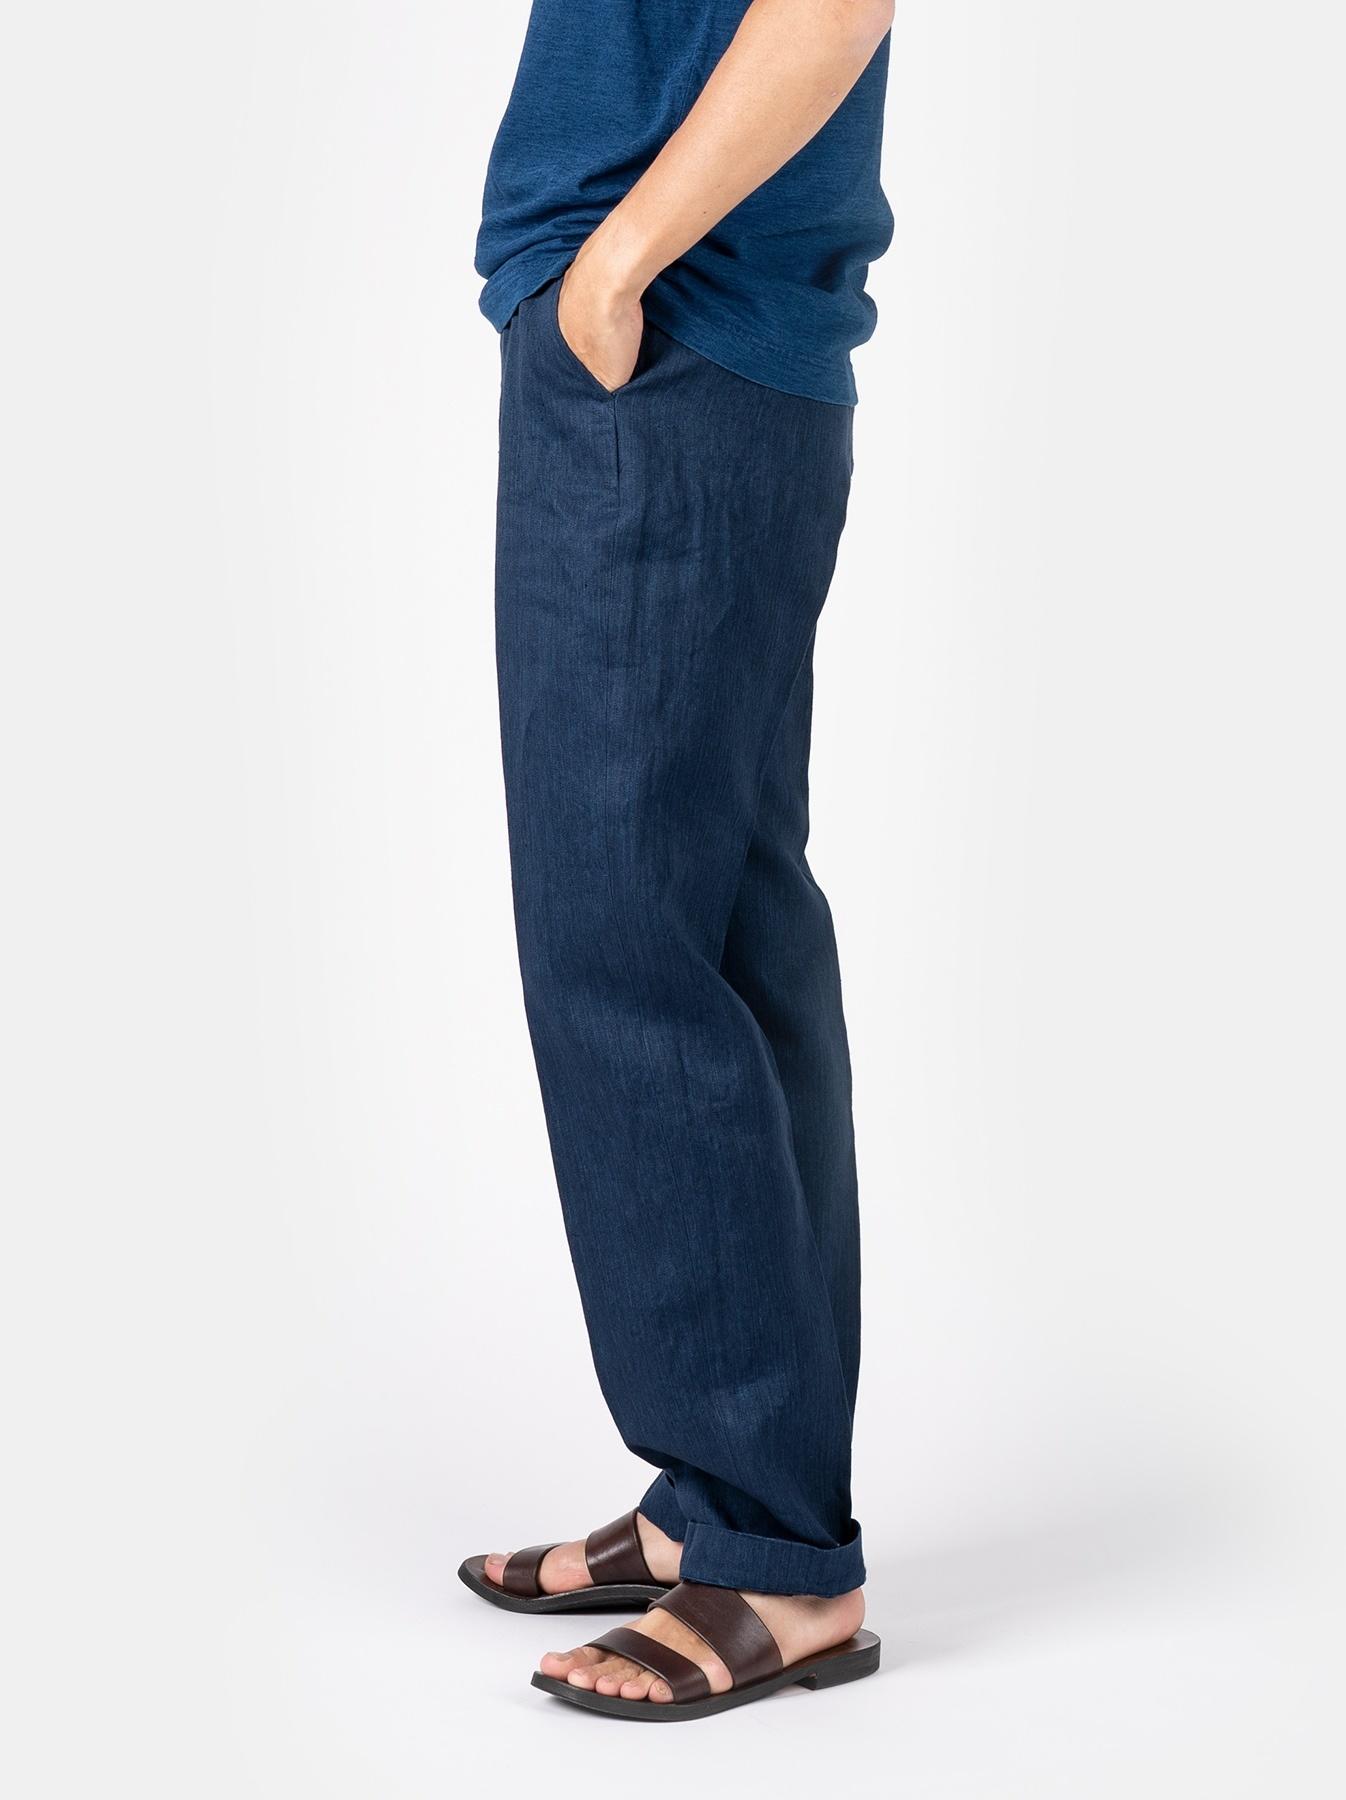 WH Indigo Linen Easy Slacks-4